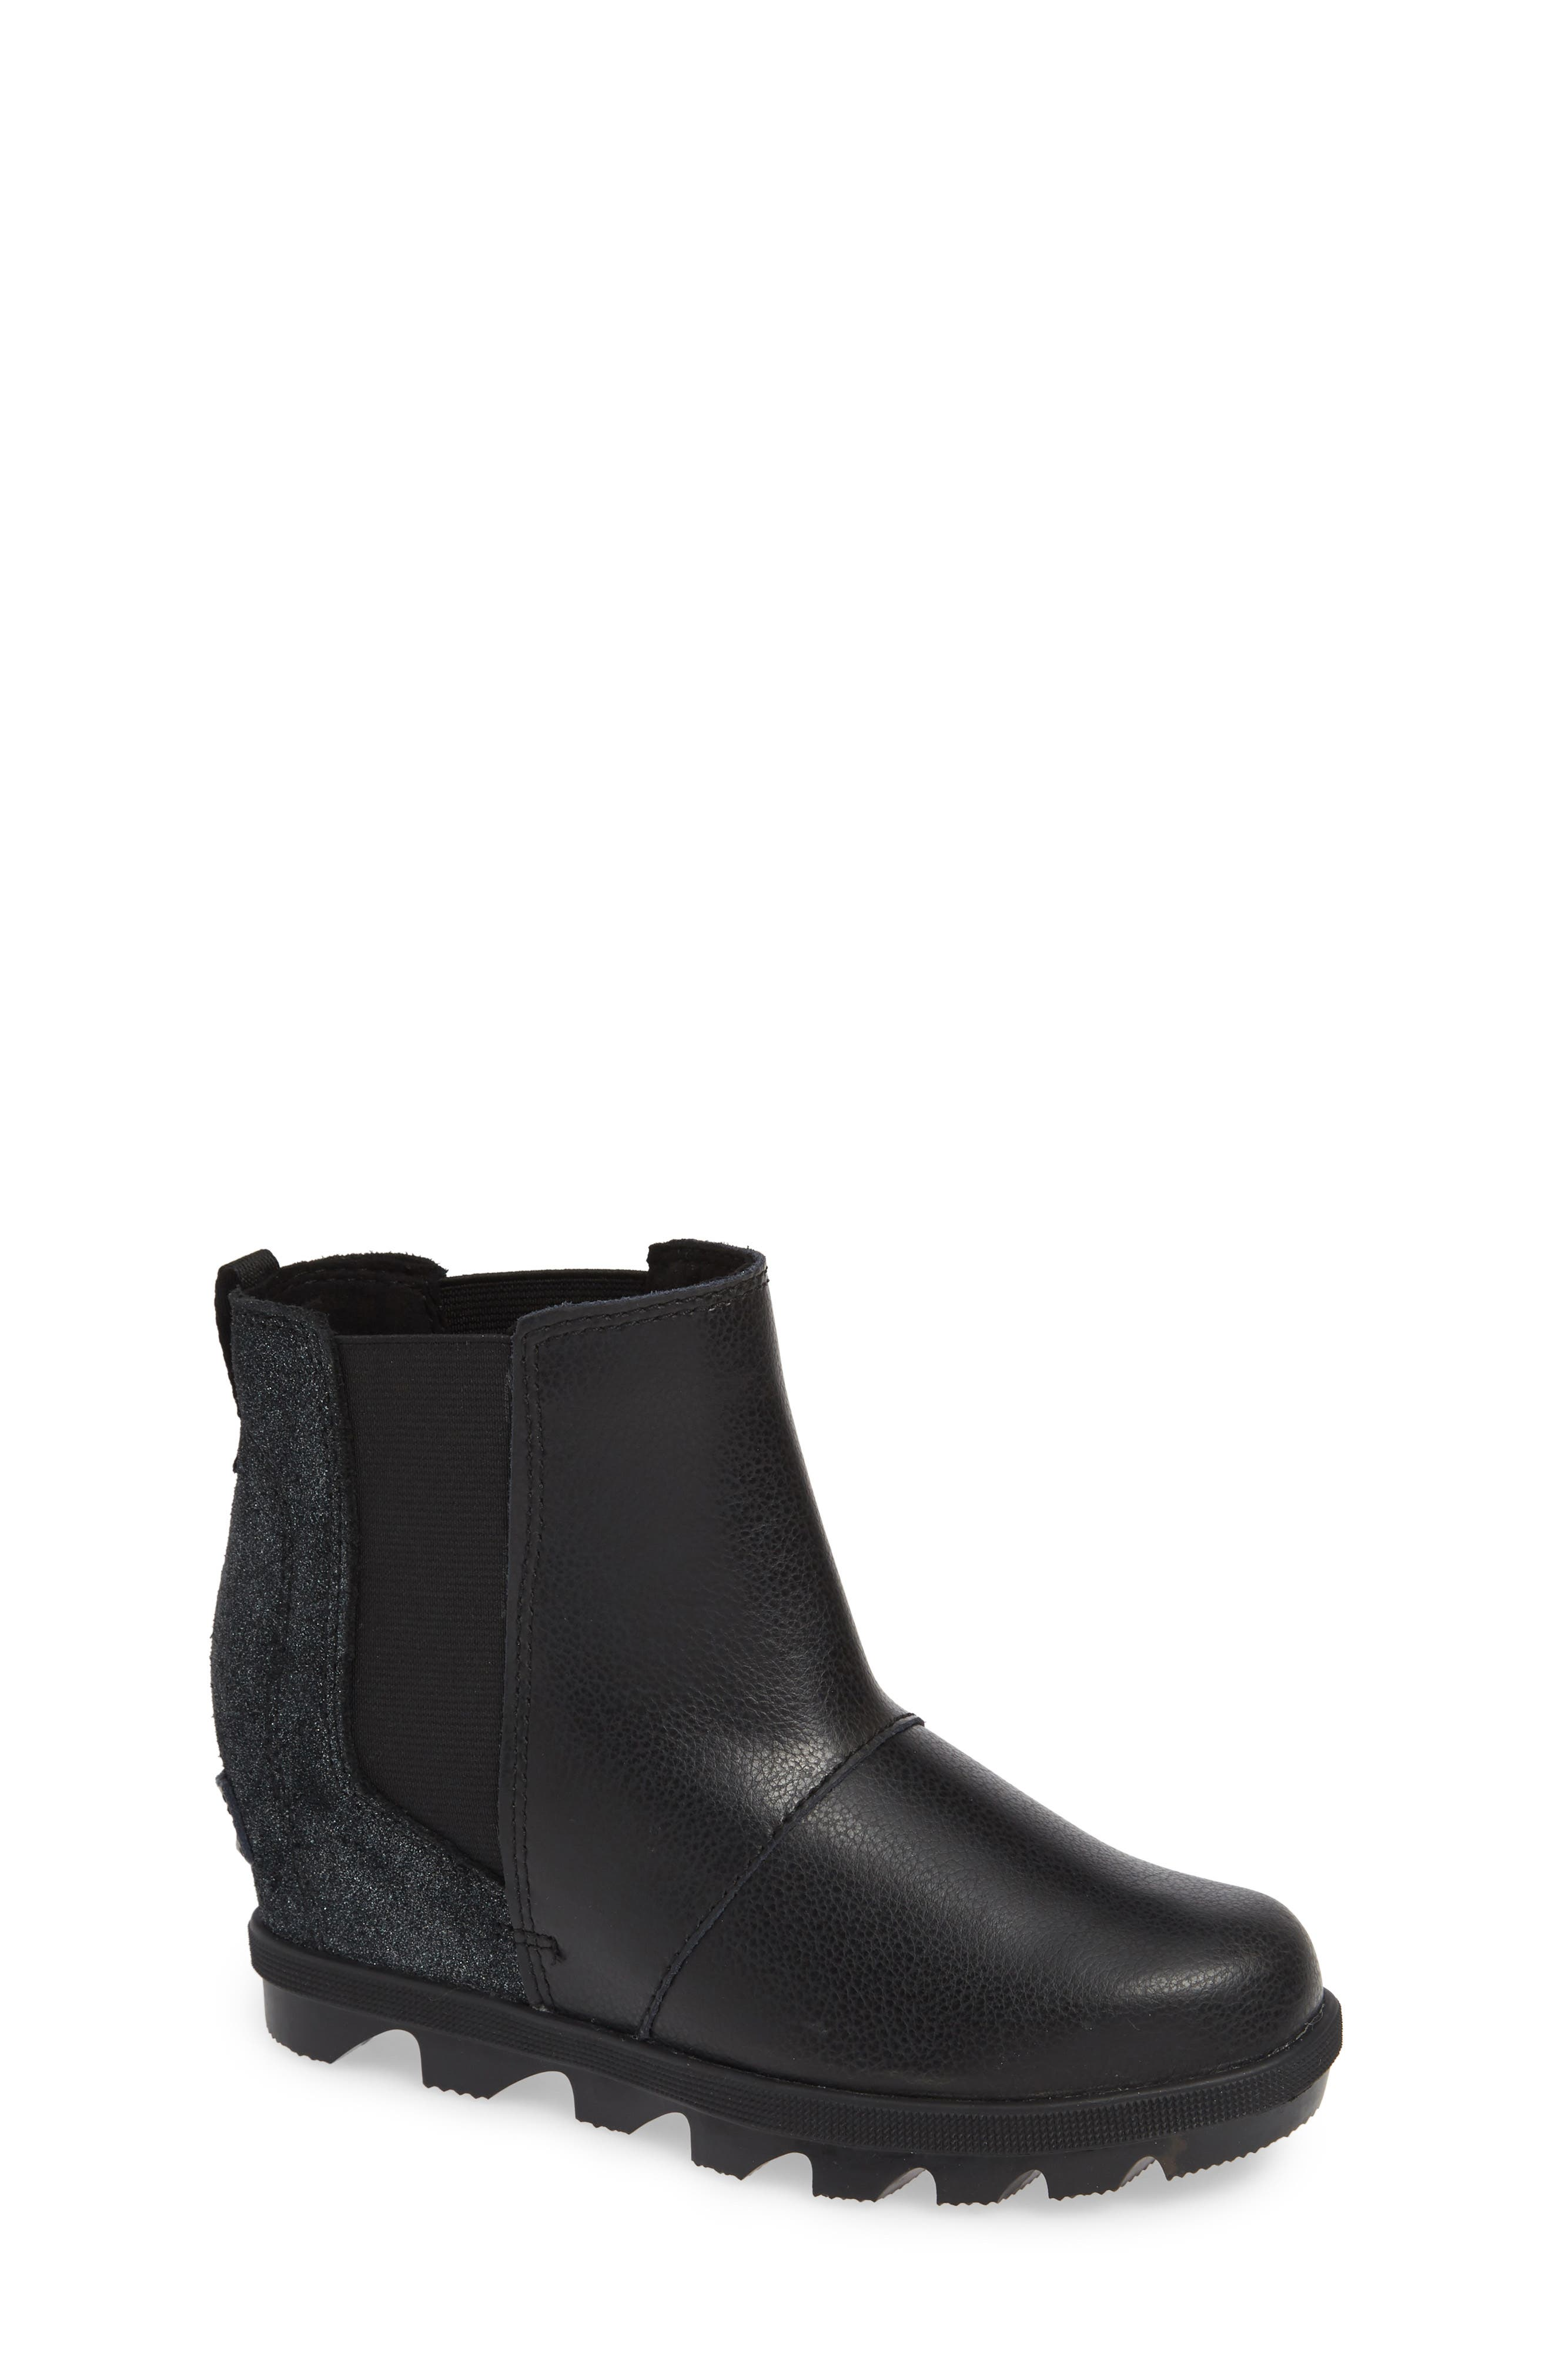 Joan of Arc II Waterproof Wedge Chelsea Boot,                             Main thumbnail 1, color,                             BLACK